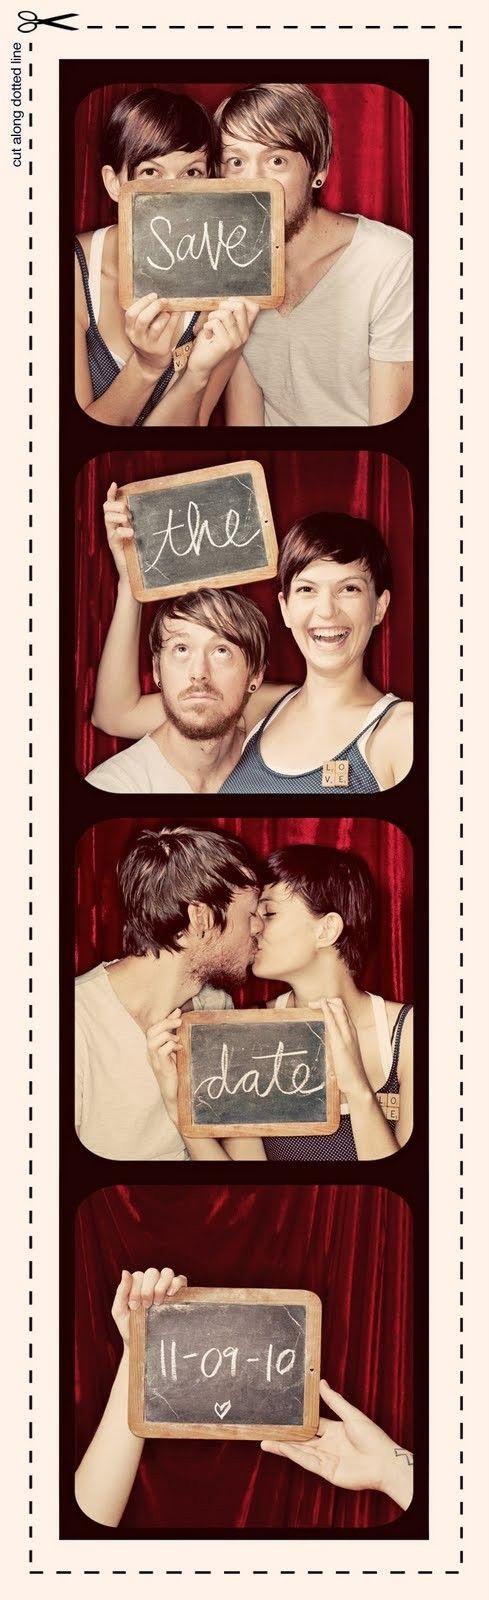 #wedding #invitation #rustic #DIY #vintagePhotos Booths, Invitations, Dreams, Wedding Ideas, Cute Ideas, Saving, Photo Booths, Date Ideas, Engagement